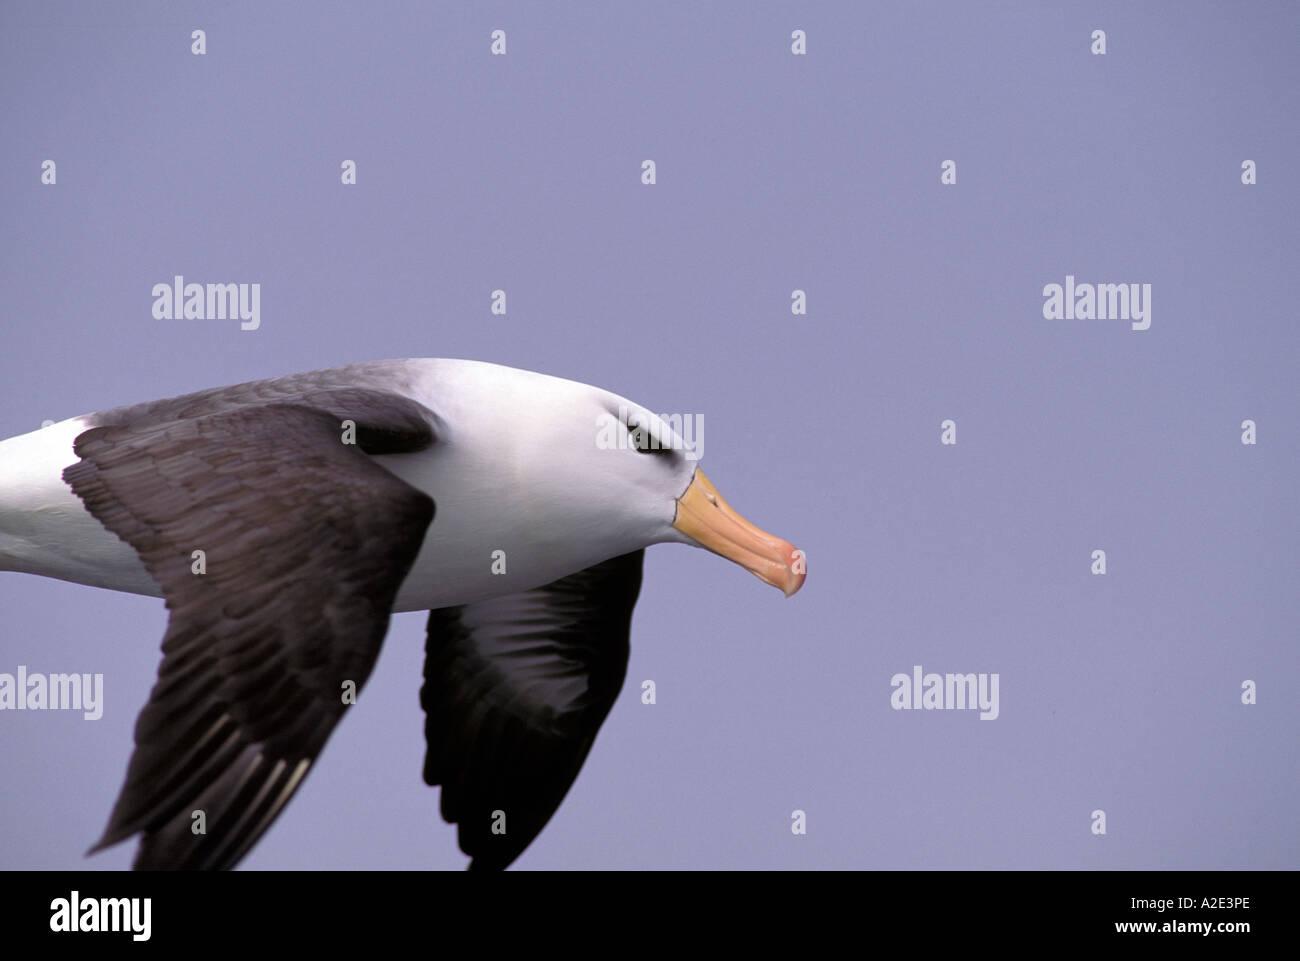 Antarctica, Sub-Antarctic Islands, South Georgia. Black-Browed Albatross close-up - Stock Image